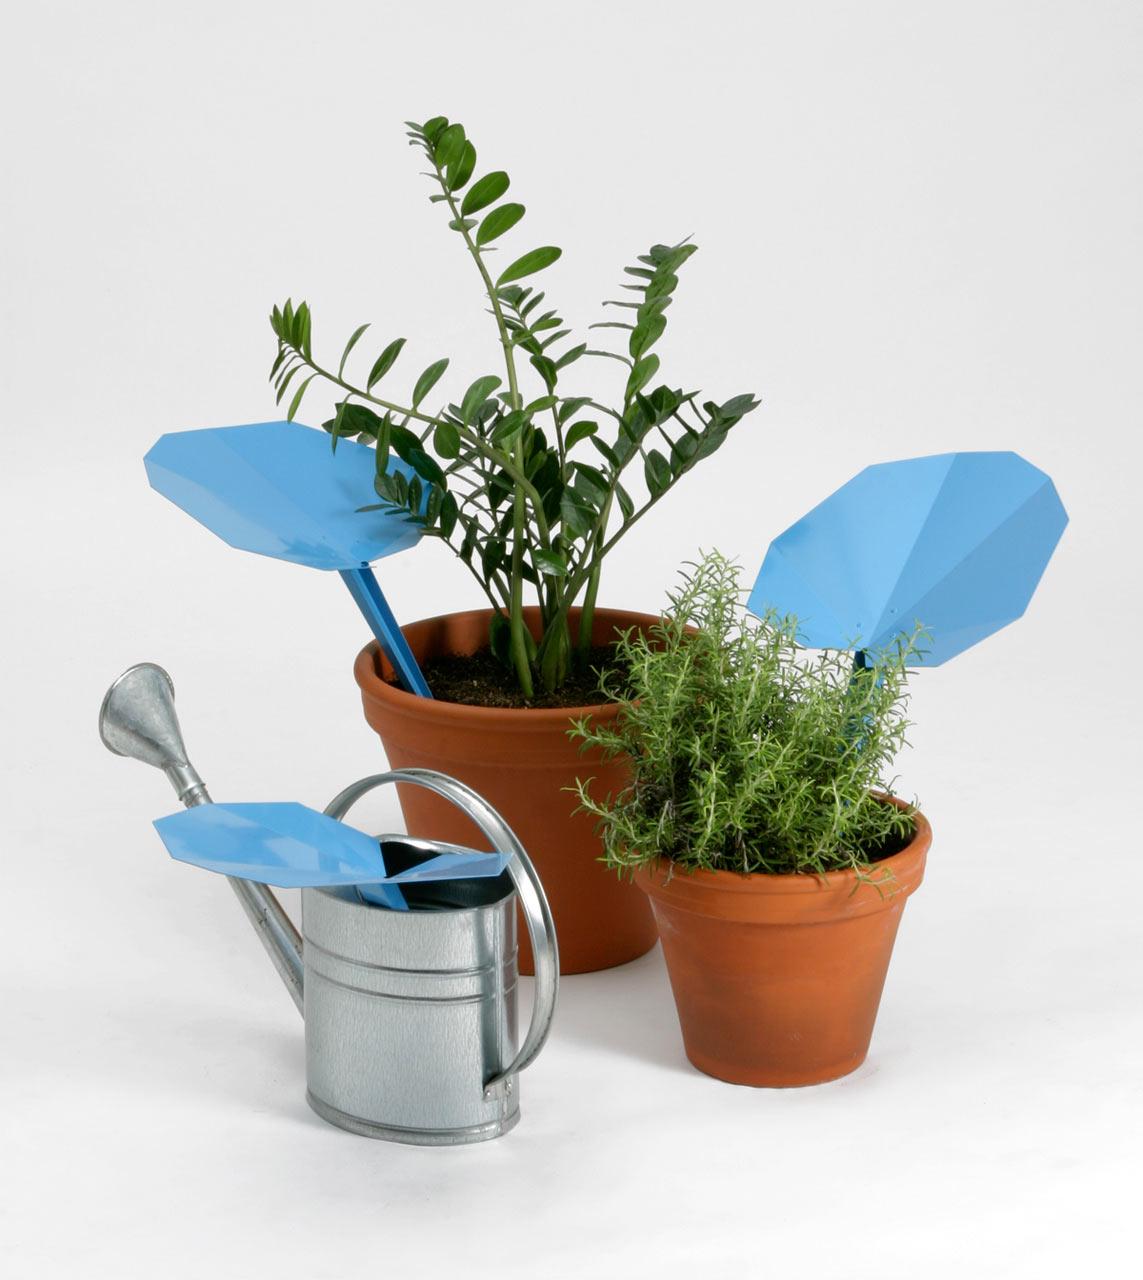 reLEAF Rainwater Collector for Teracrea